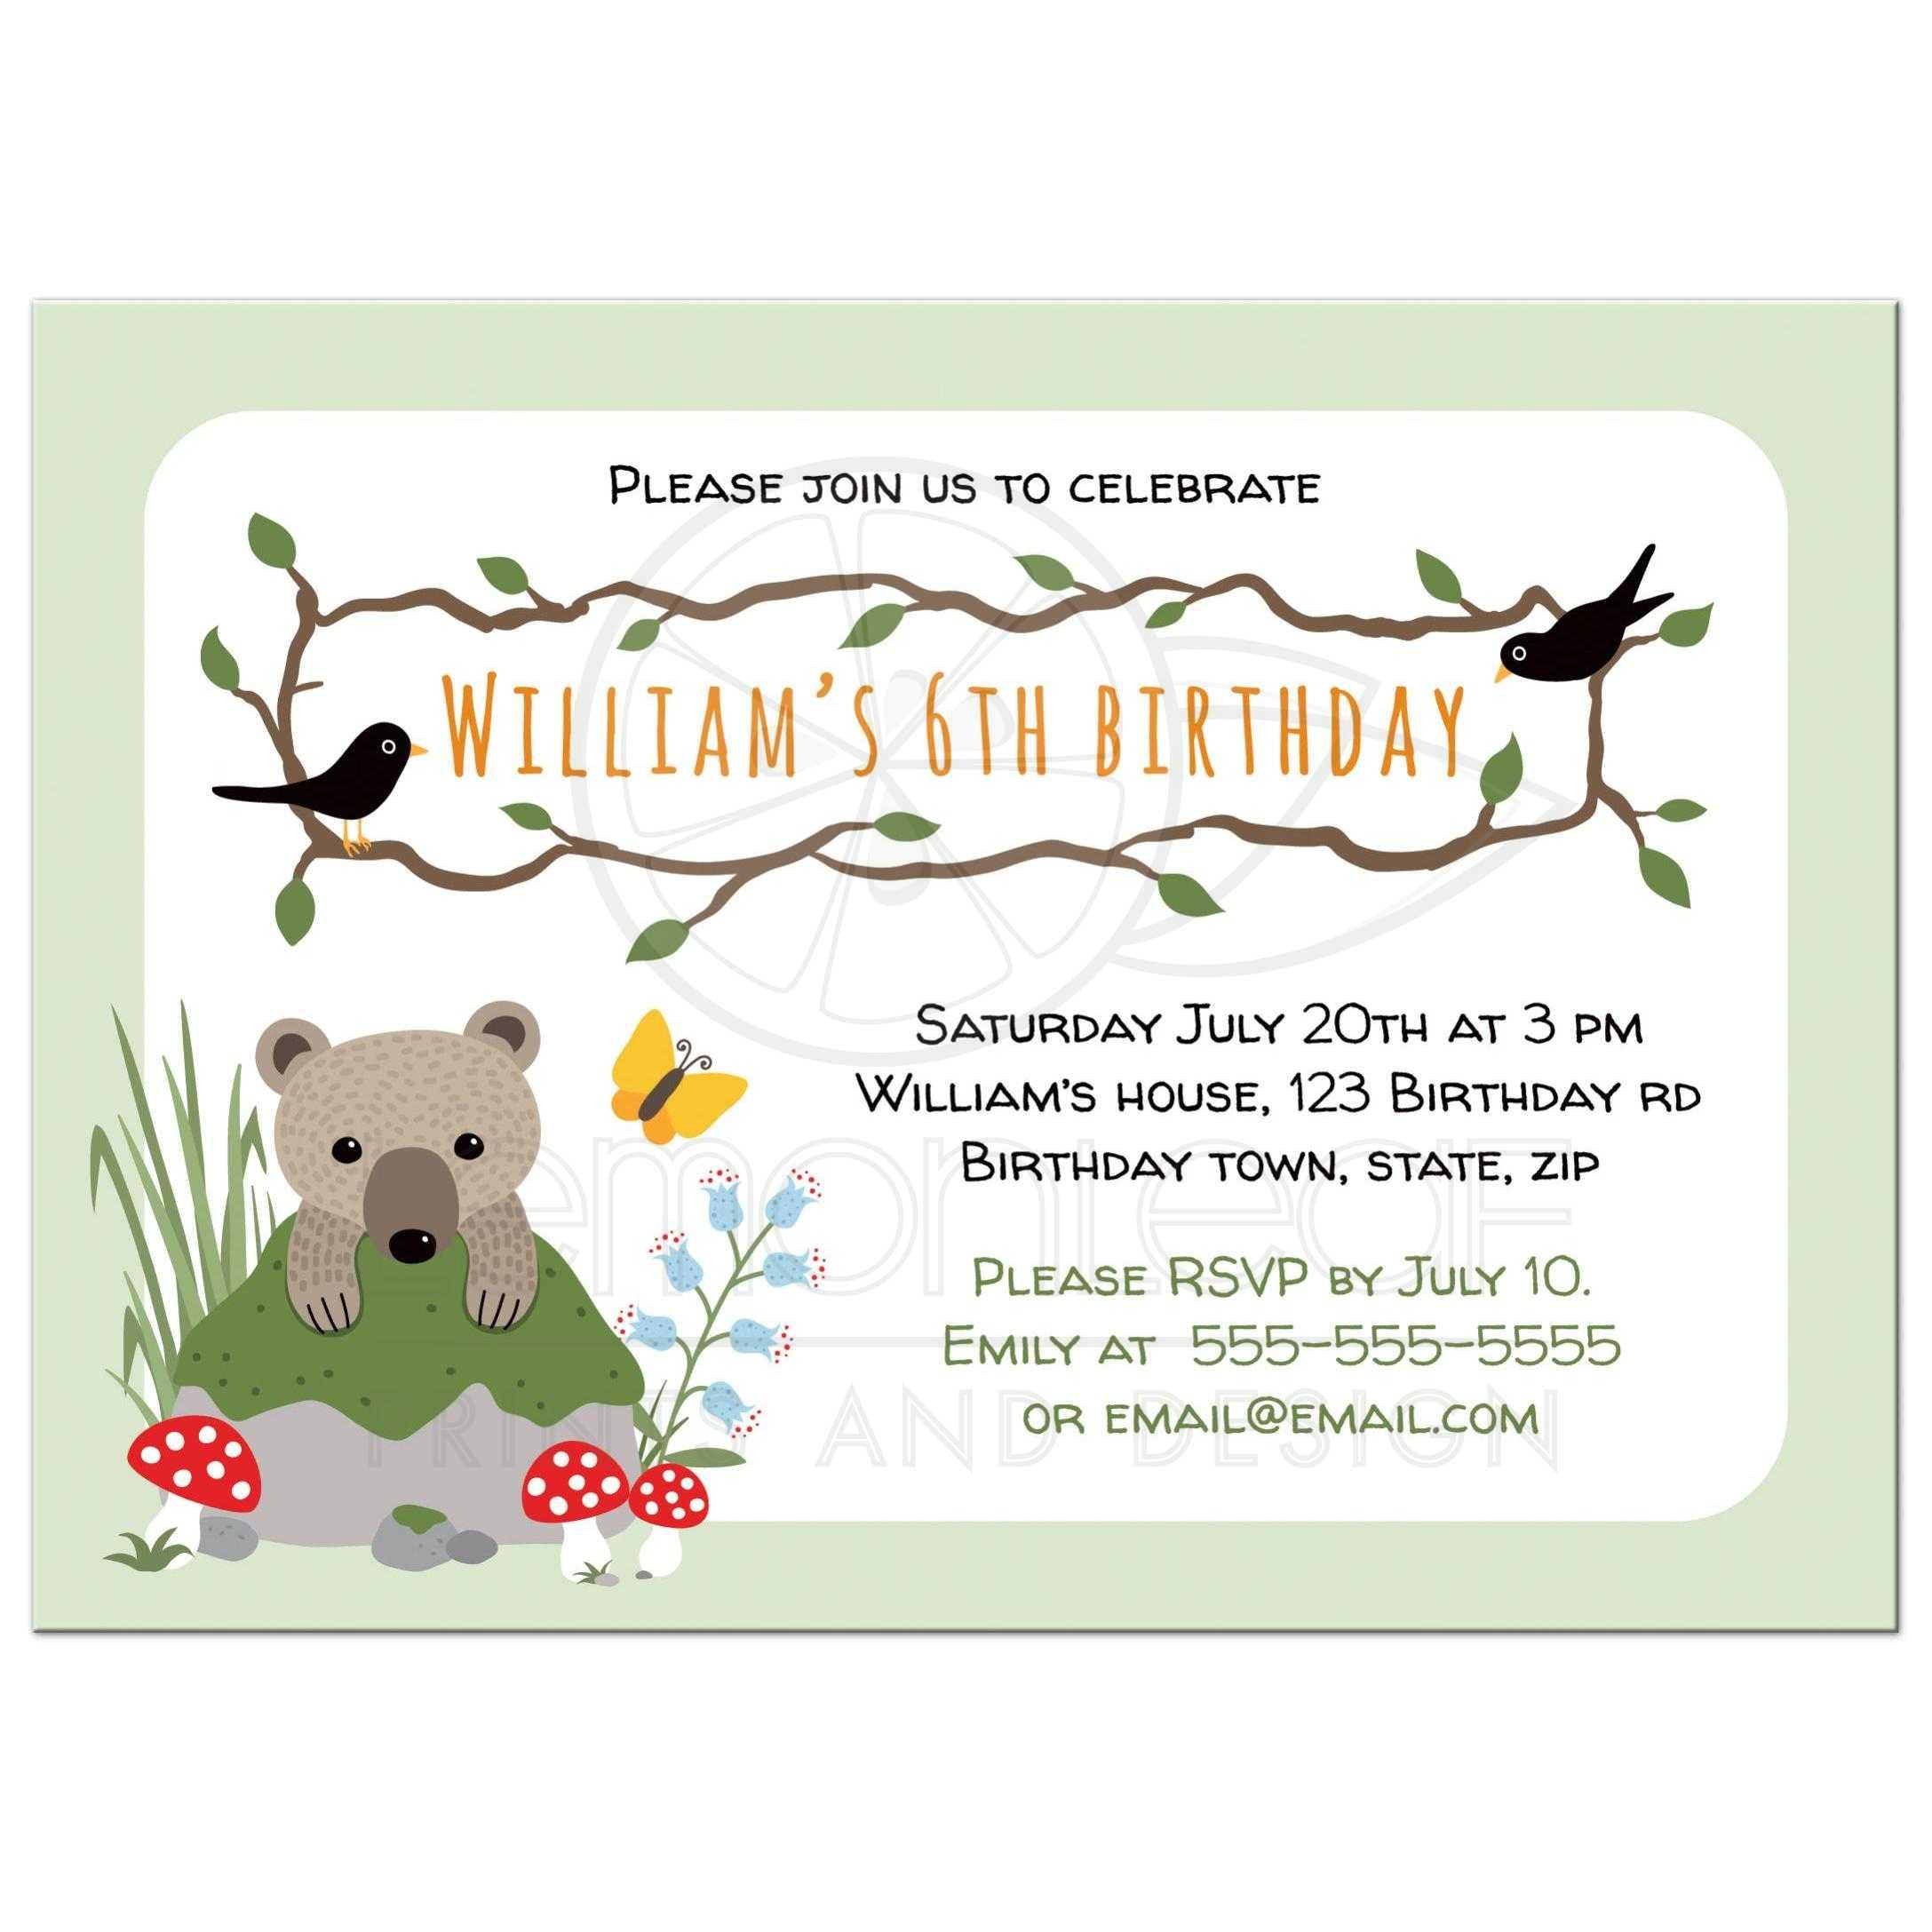 Cute woodland birthday party invitation with bear cub behind mossy rock